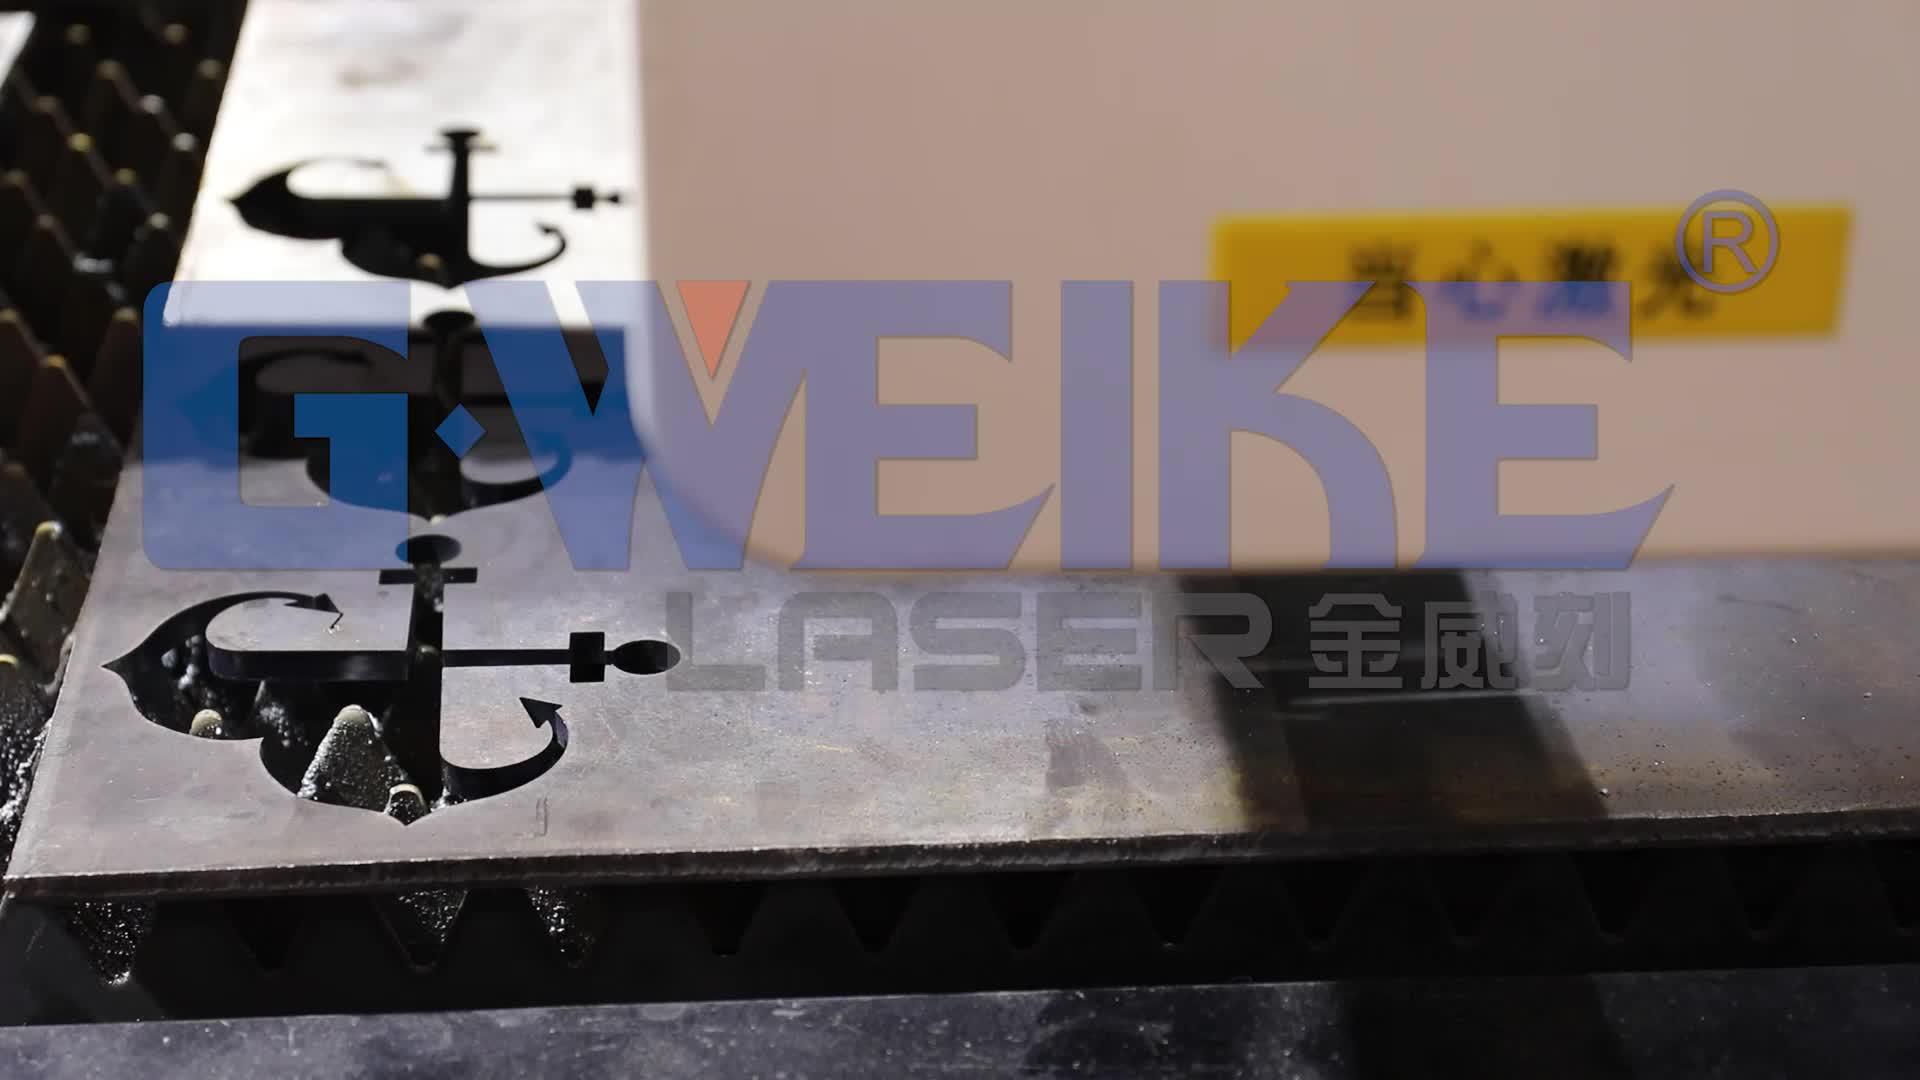 Metal sheet 1000w ipg fiber laser 500w 1500x3000 fiber laser cutting machine